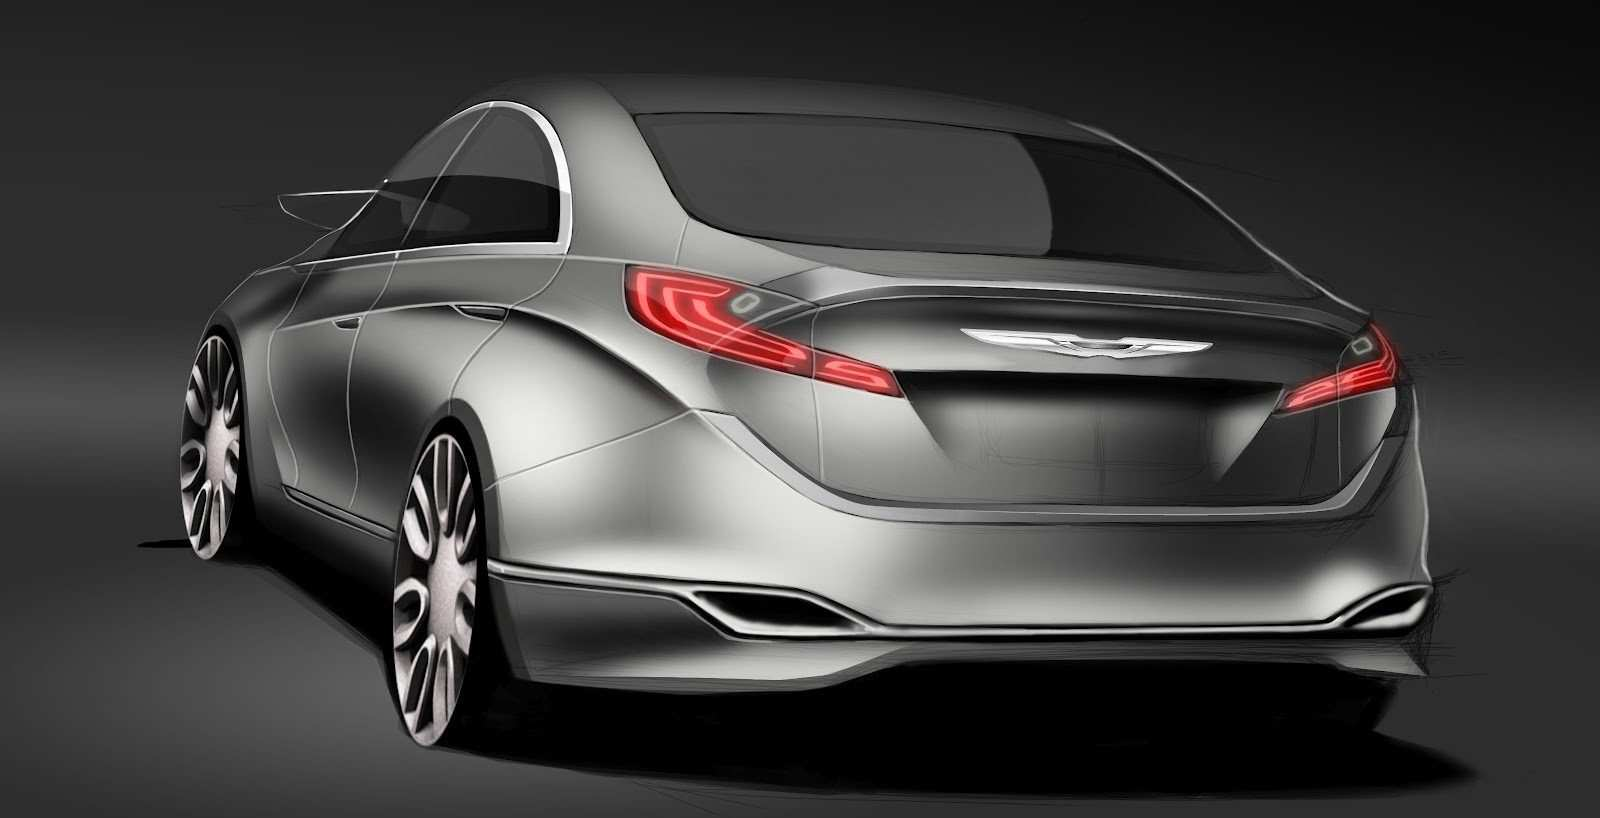 34 Gallery of New Chrysler 2020 Configurations for New Chrysler 2020